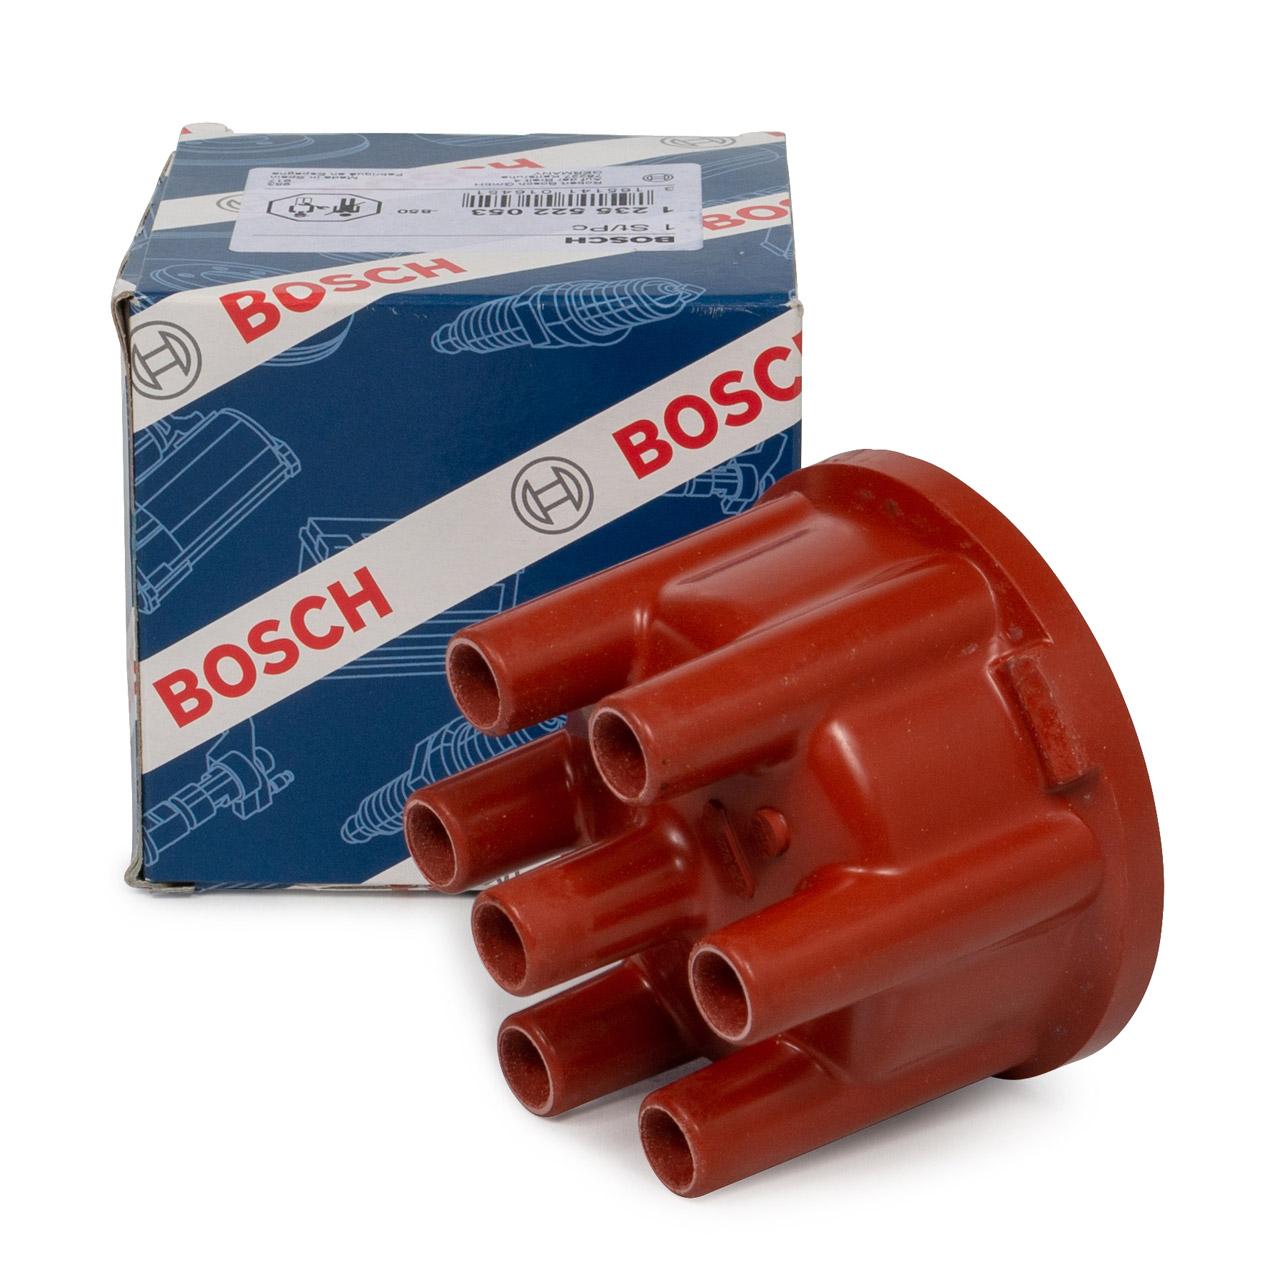 BOSCH 1235522053 Zündverteilerkappe PORSCHE 911 3.0 3.3 Carrera / SC / Turbo